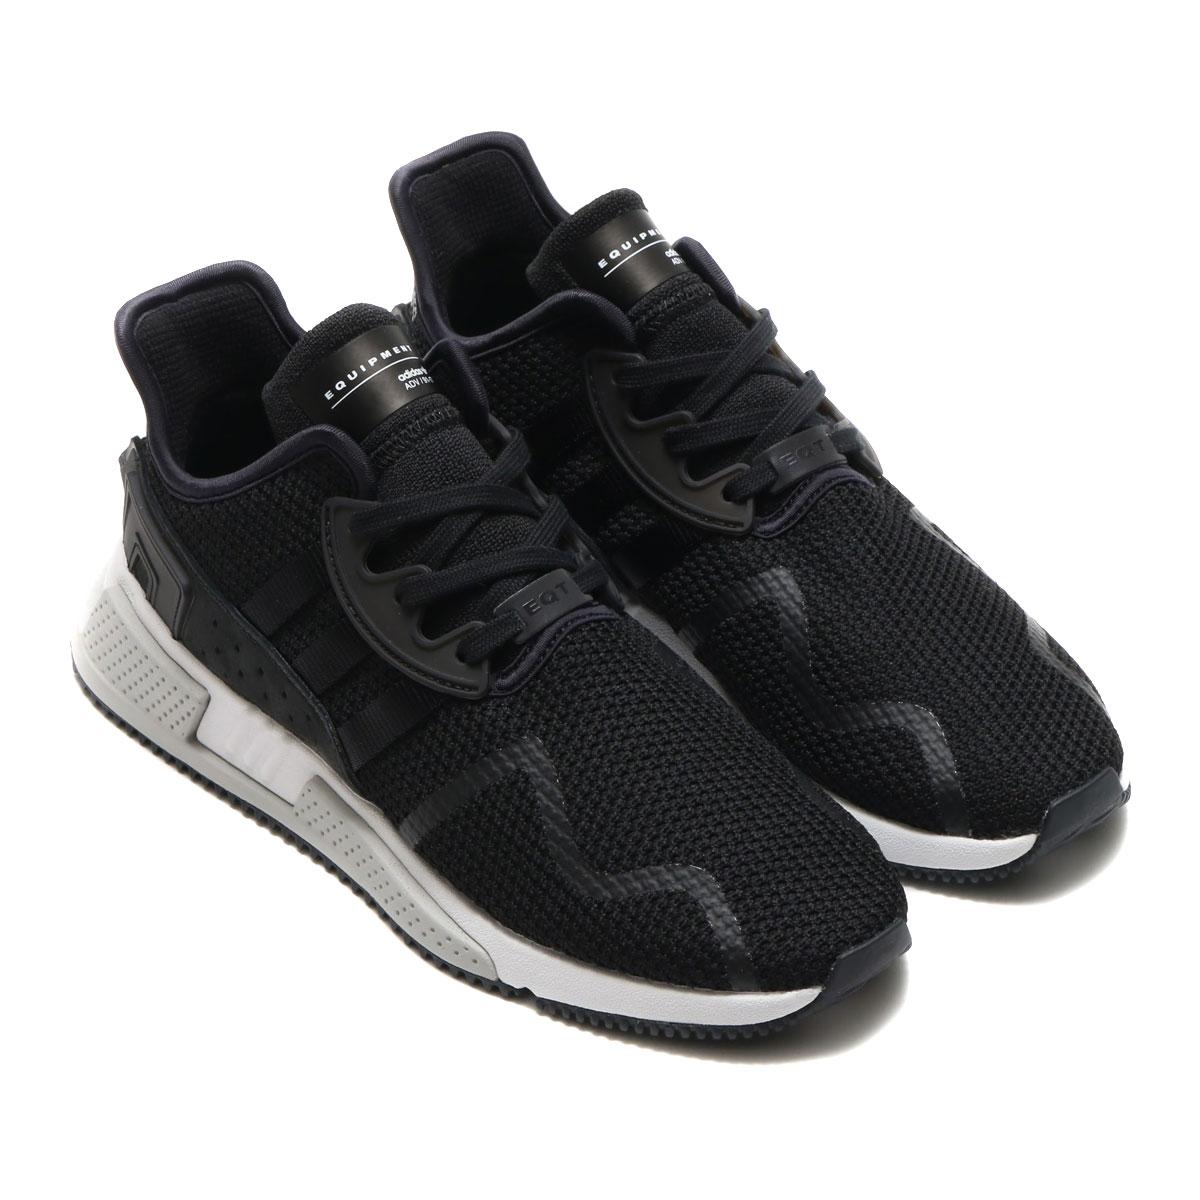 on sale 1bbfd 68079 adidas Originals EQT CUSHION ADV (Adidas originals EQT CUSHION ADV) Core  Black/Footwear White 17FW-I